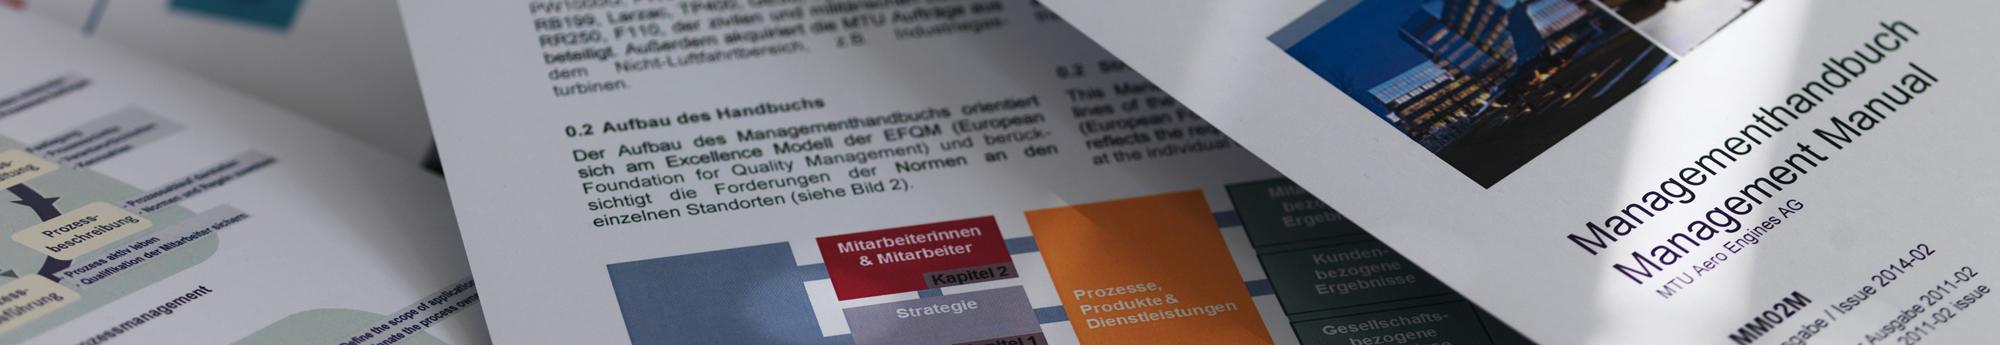 Natco pharma stock recommendation report